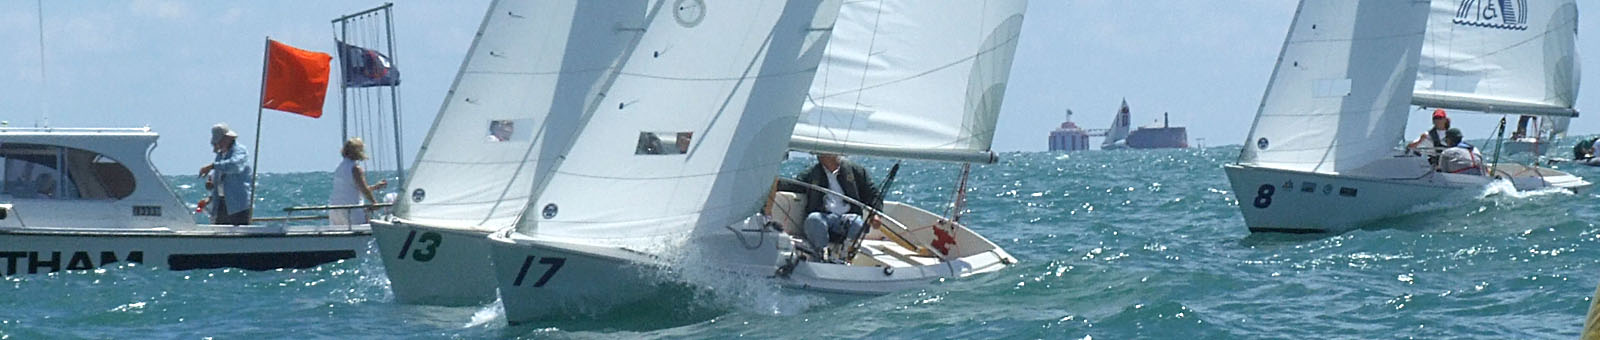 Judd Goldman Adaptive Sailing Foundation Racing Programs